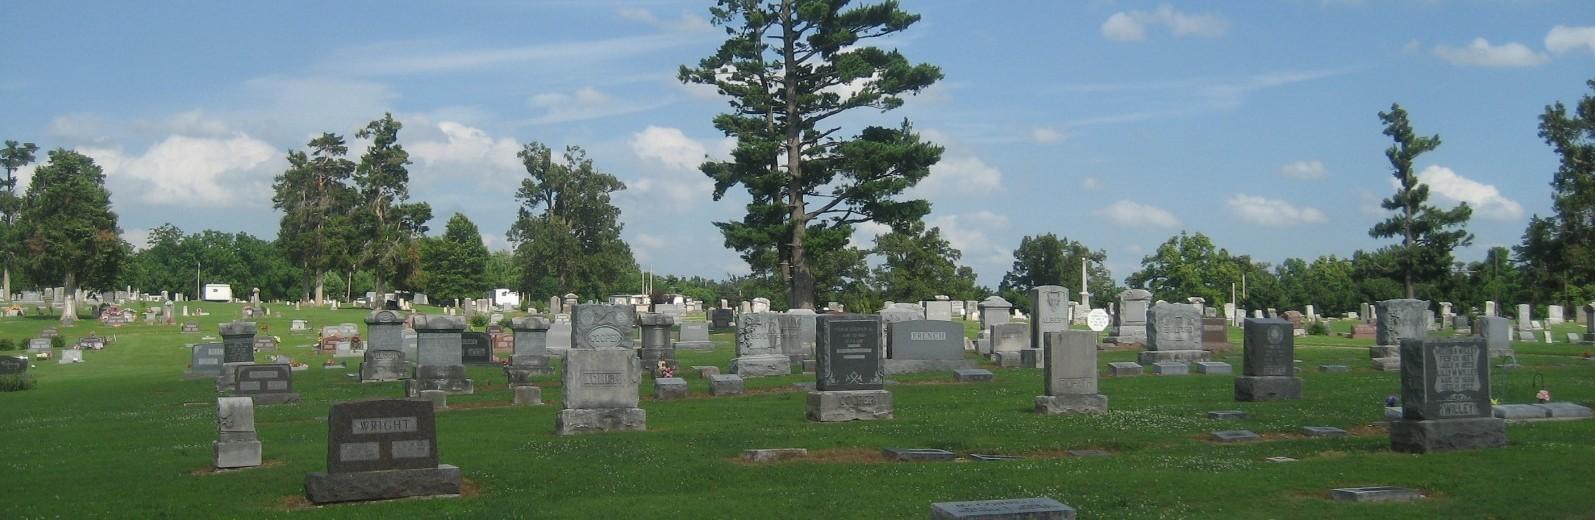 Pierce City Cemetery